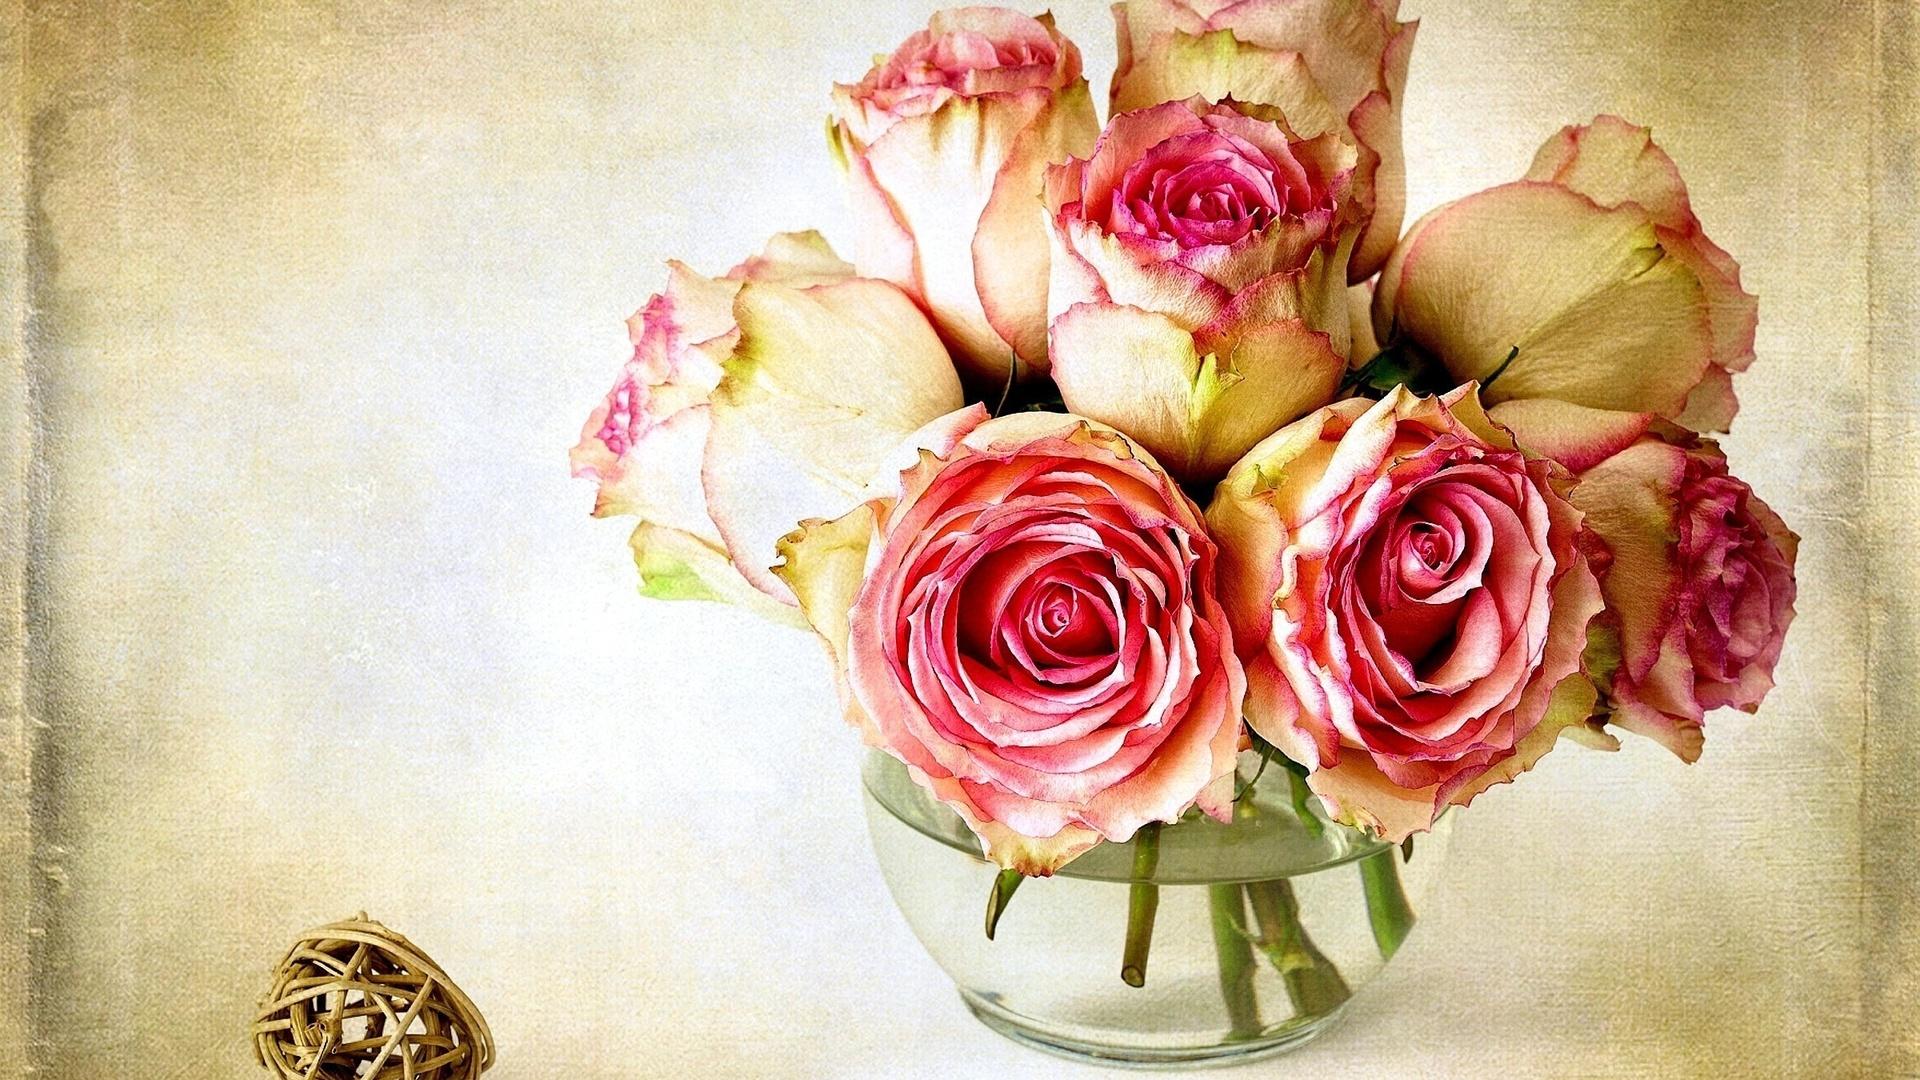 Vase Wallpaper HD Freetopwallpapercom 1920x1080